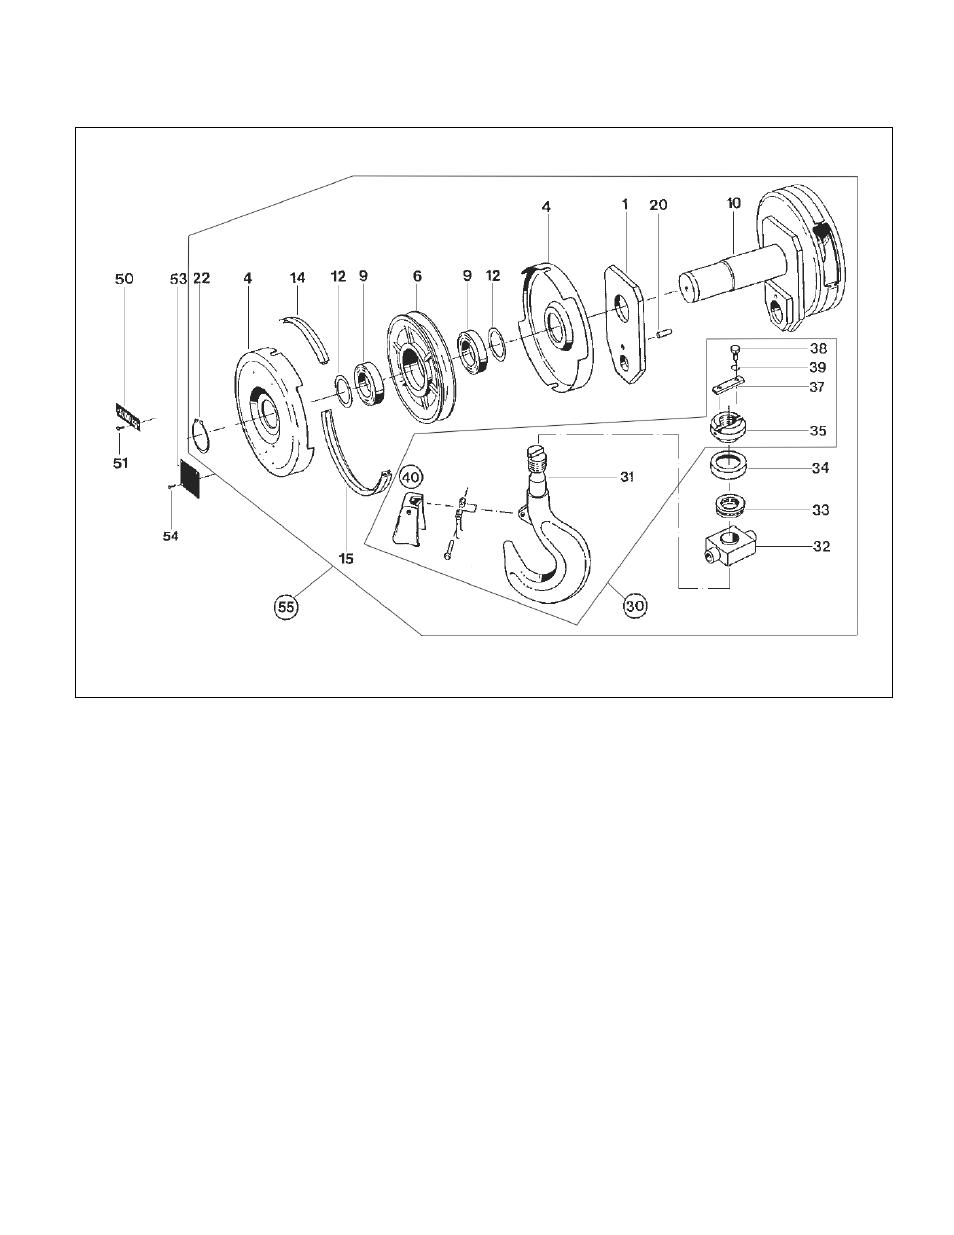 medium resolution of harrington hoists and cranes rhn rhino wire rope hoist user manual page 91 112